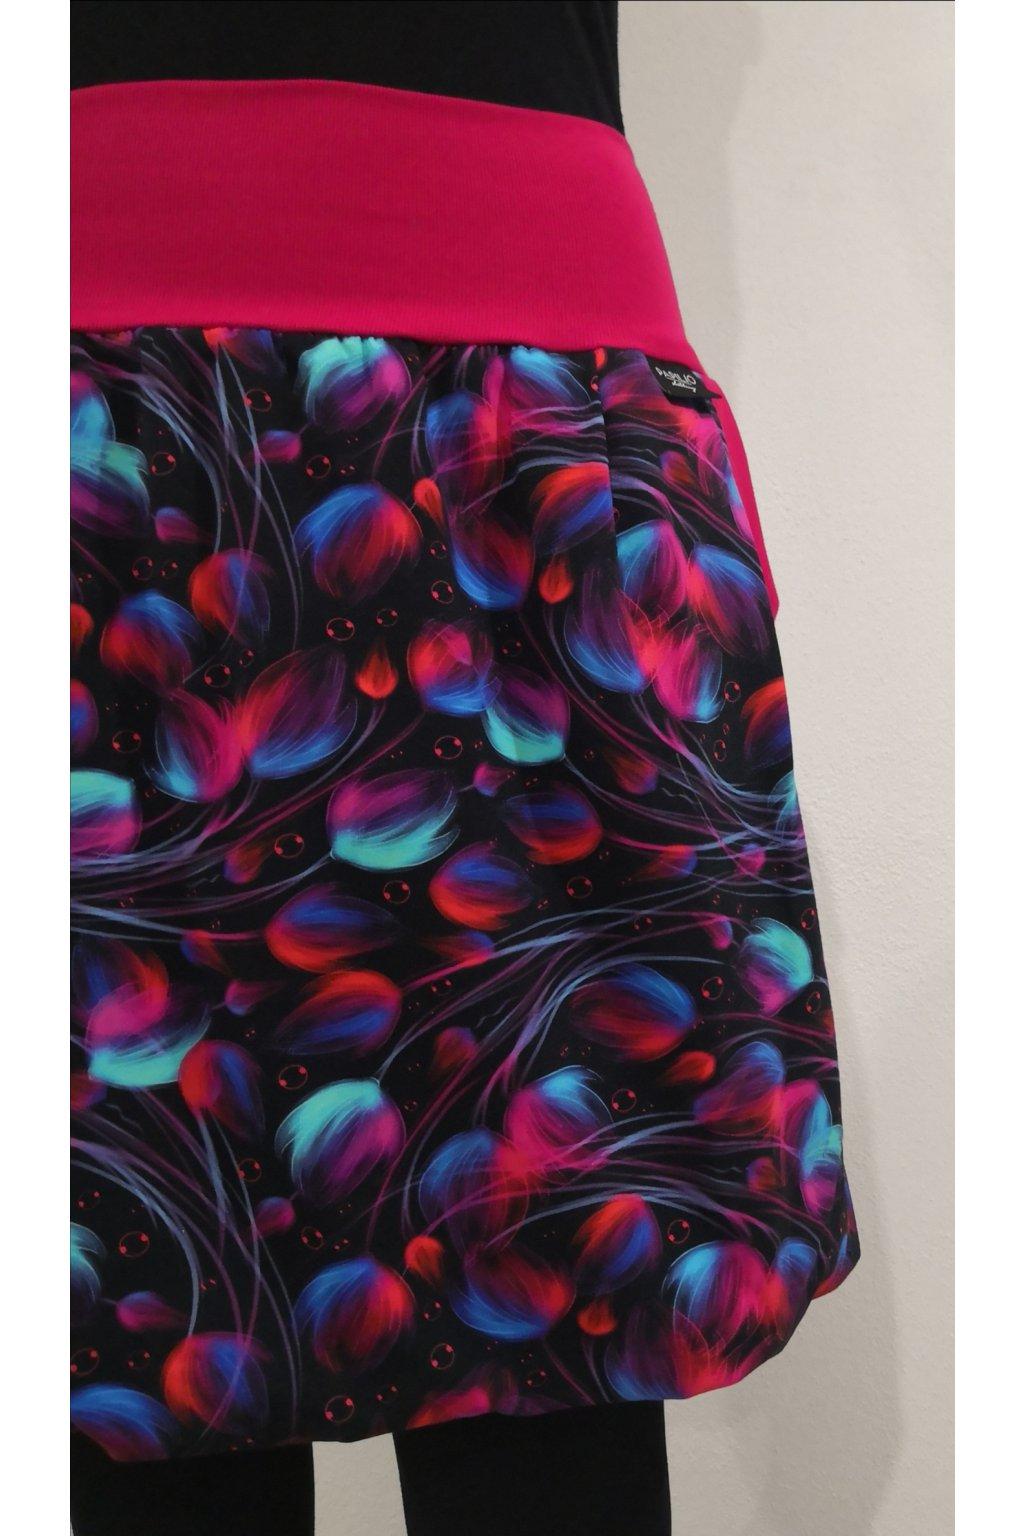 balonova sukne barevne chmiri papilio clothing (2)